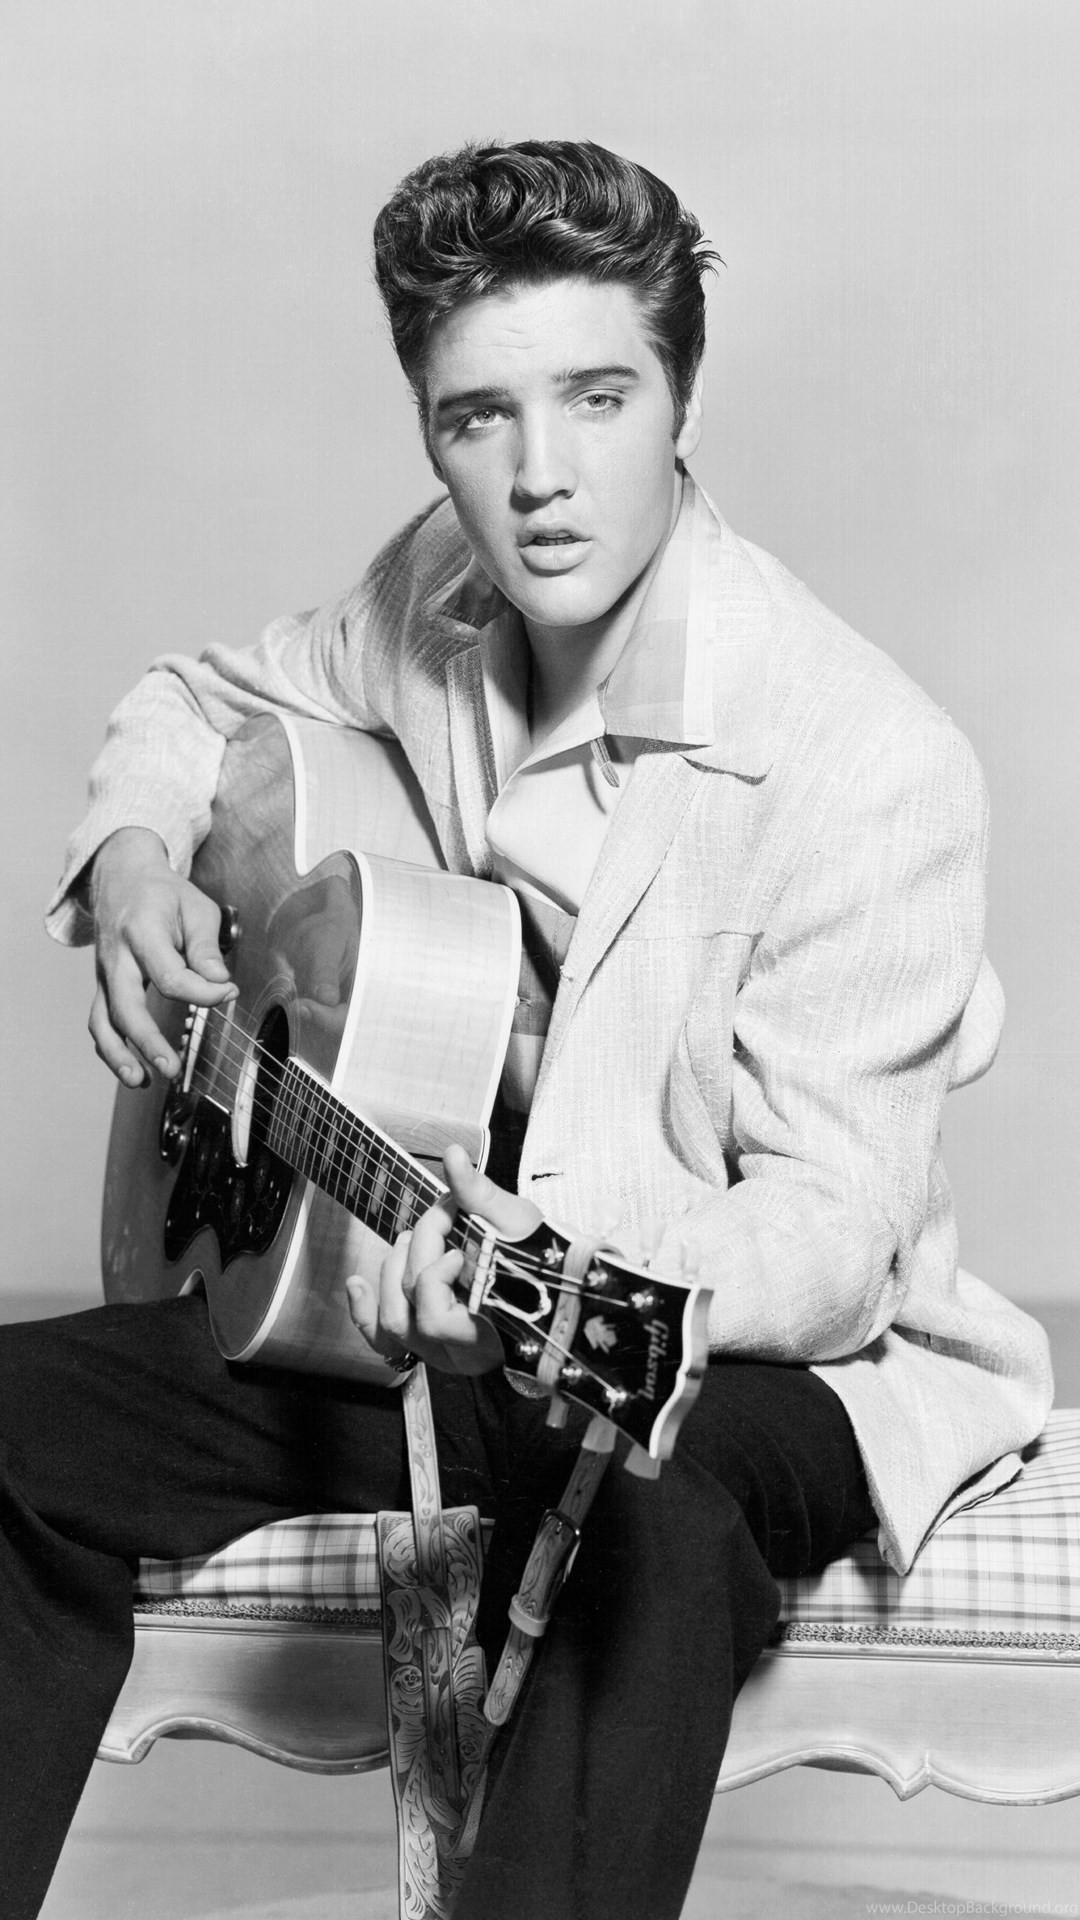 1080x1920 Elvis Presley Wallpaper For Mobile Phones Elvis Presley Wallpaper Phone 1080x1920 Wallpaper Teahub Io